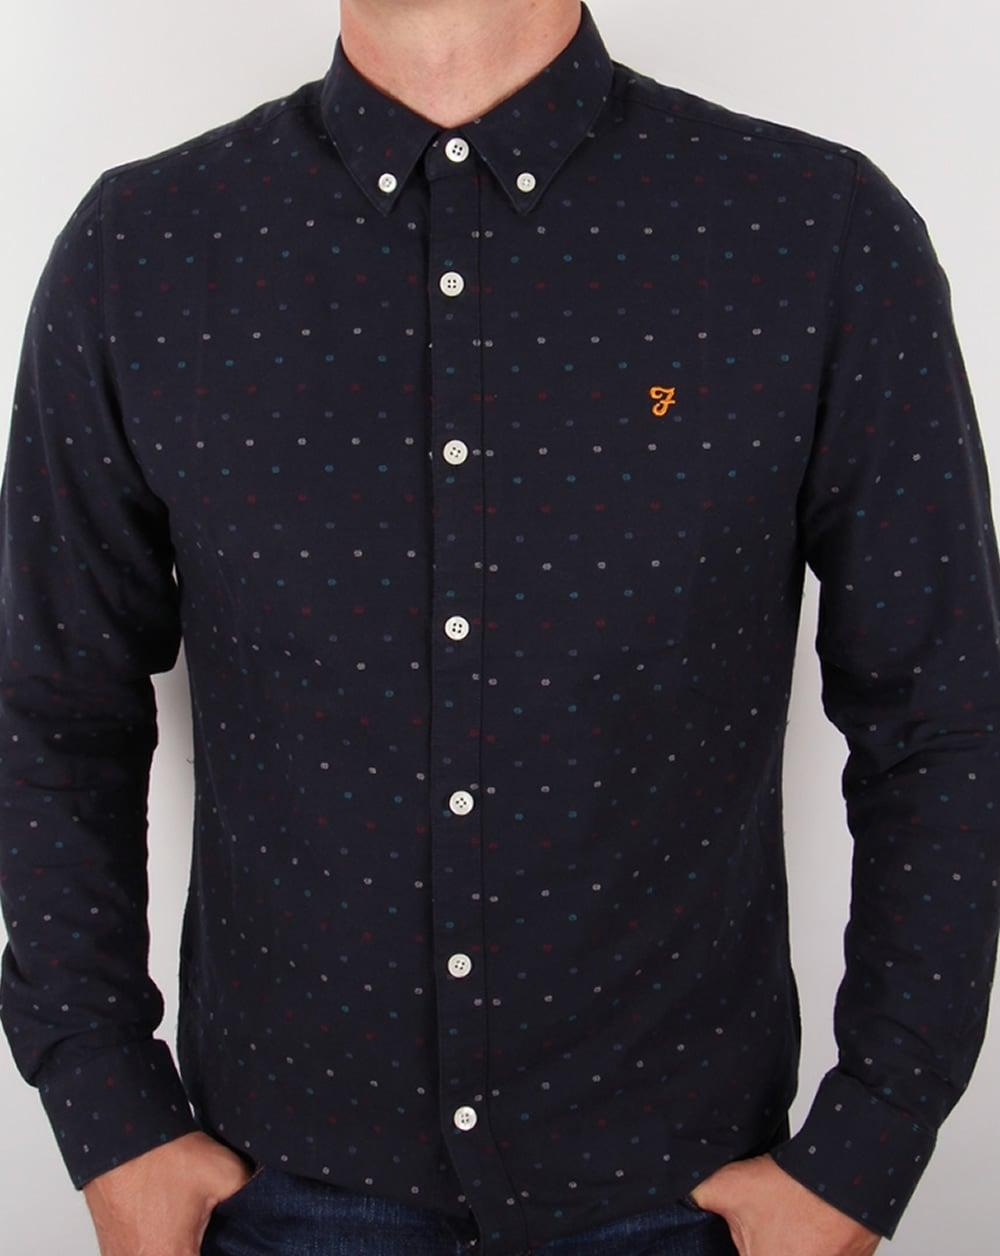 9073fdd157b4 Farah Farah Garfield Slim Fit Shirt Navy Blue